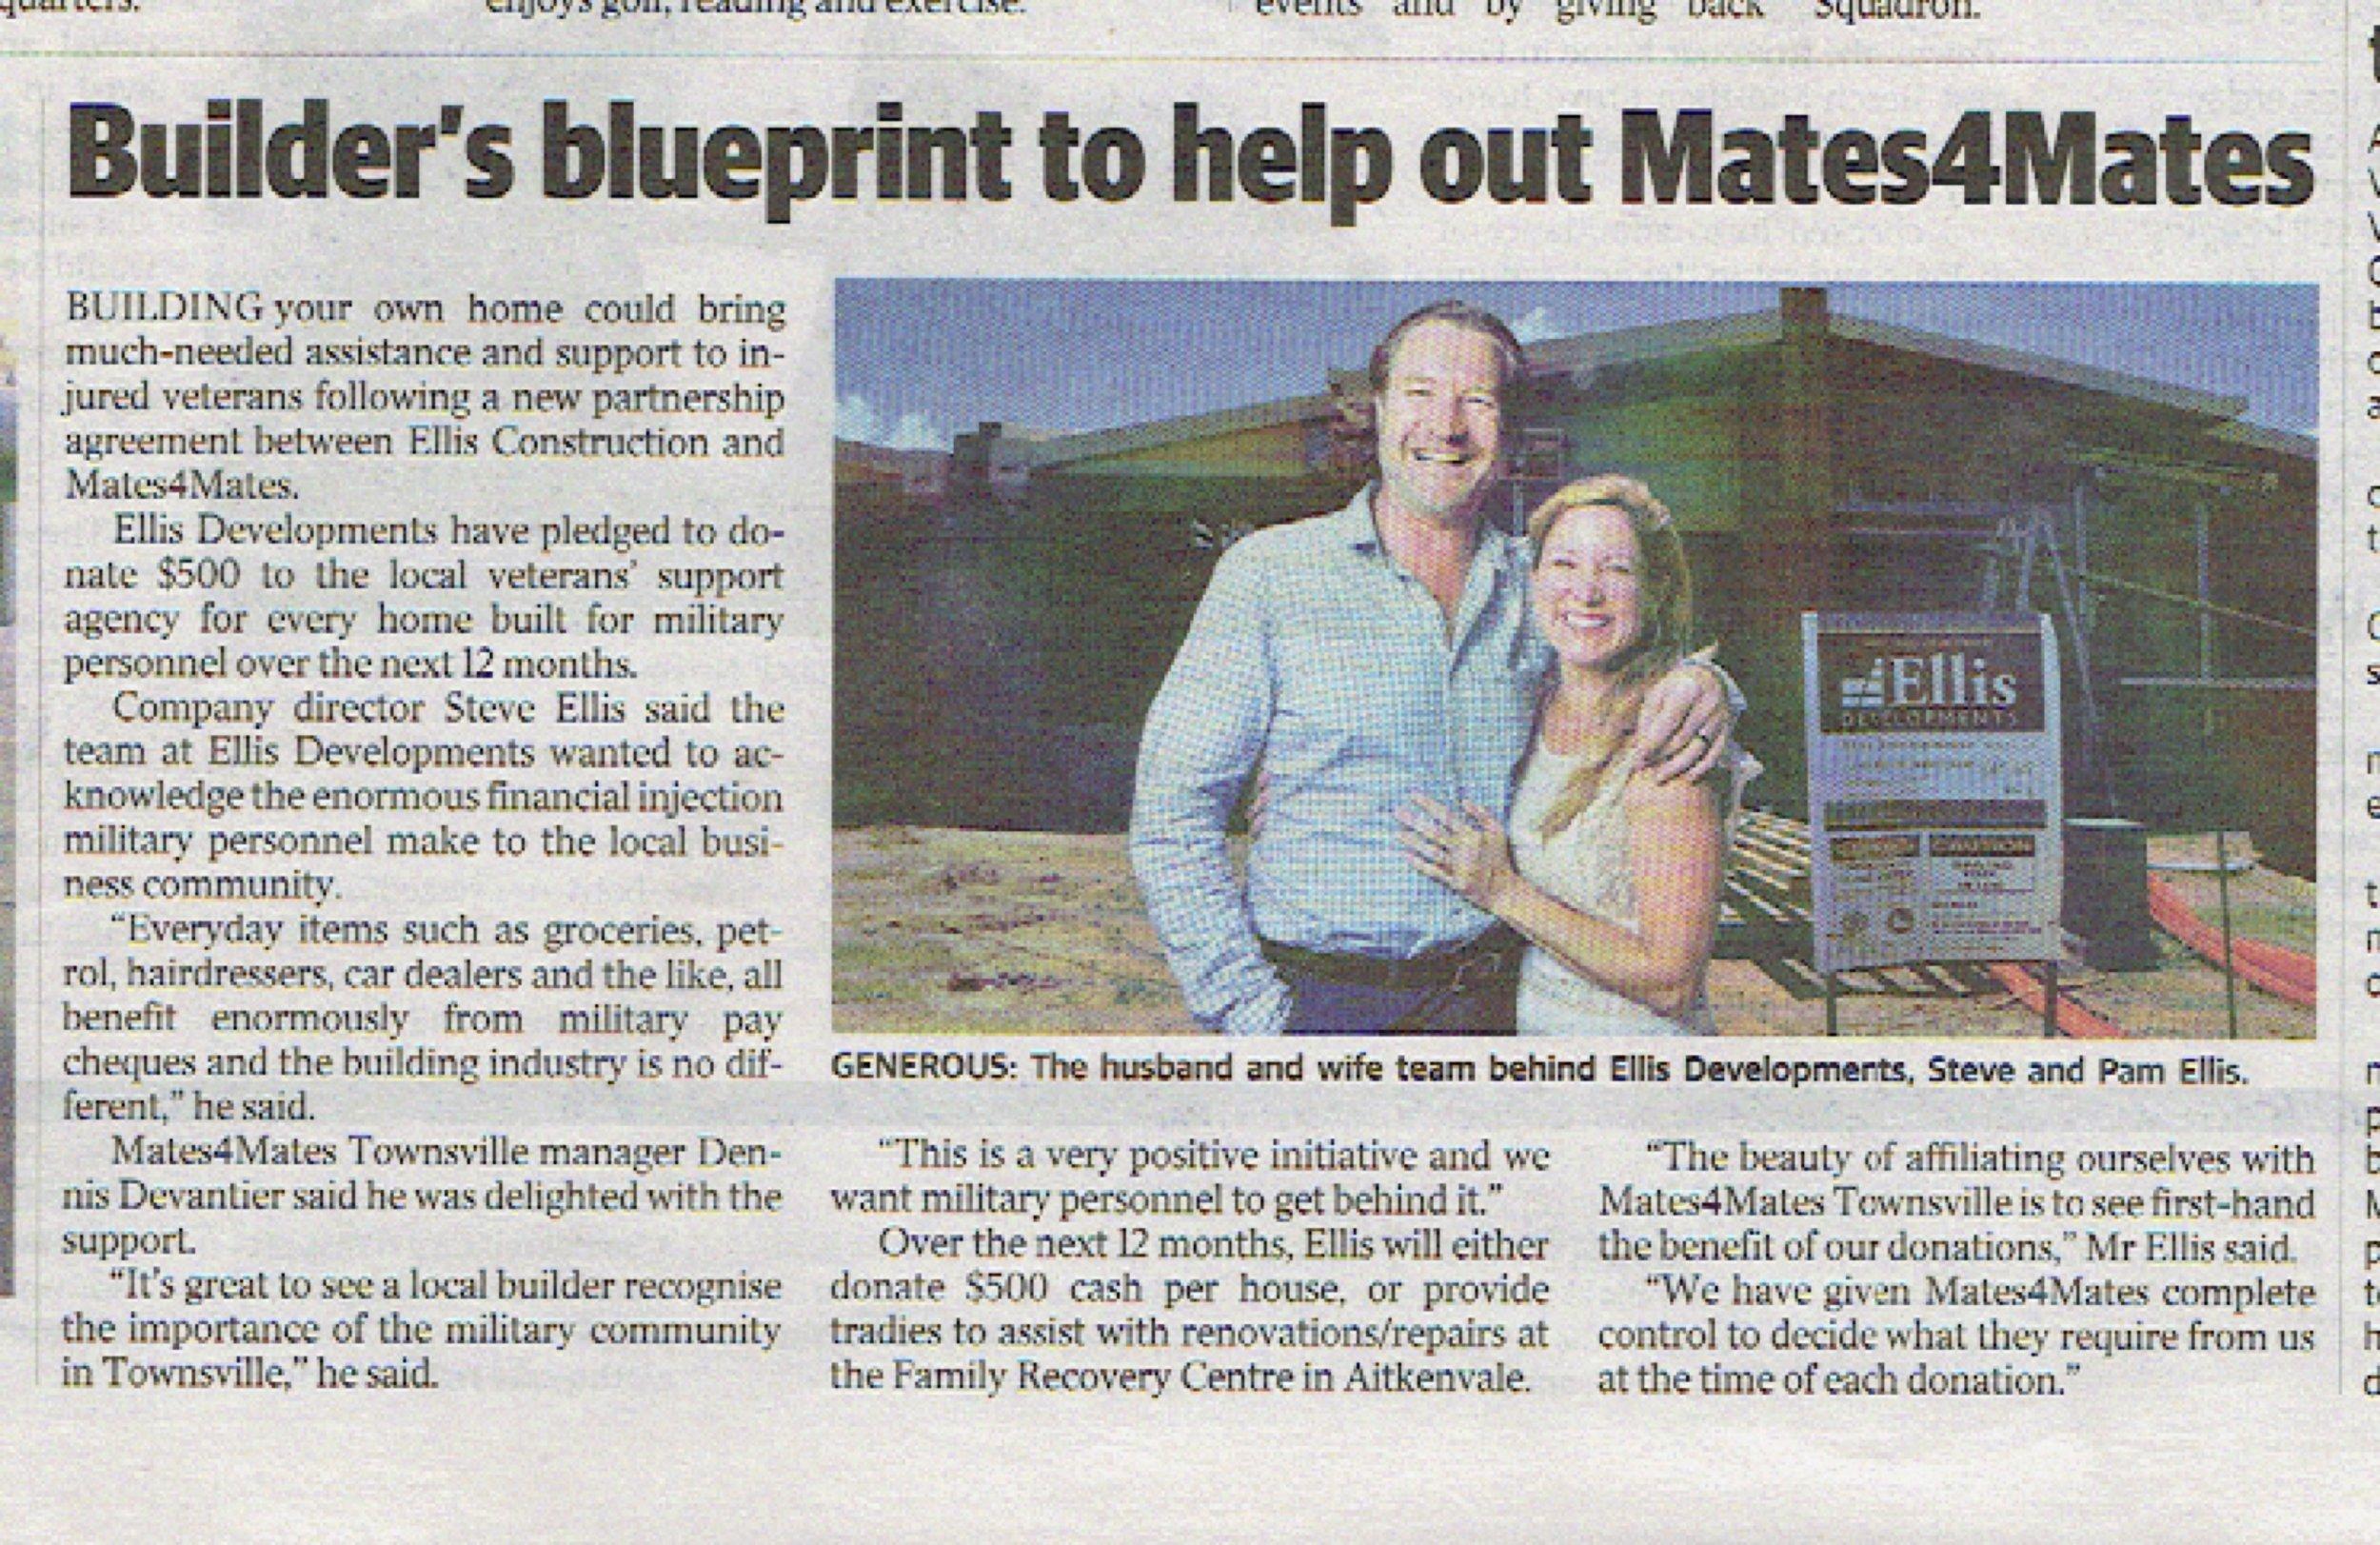 TownsvilleBulletin_Builders-blueprint-to-help-out-mates4mates_PamEllisInternational_EllisDevelopments_Article_pres